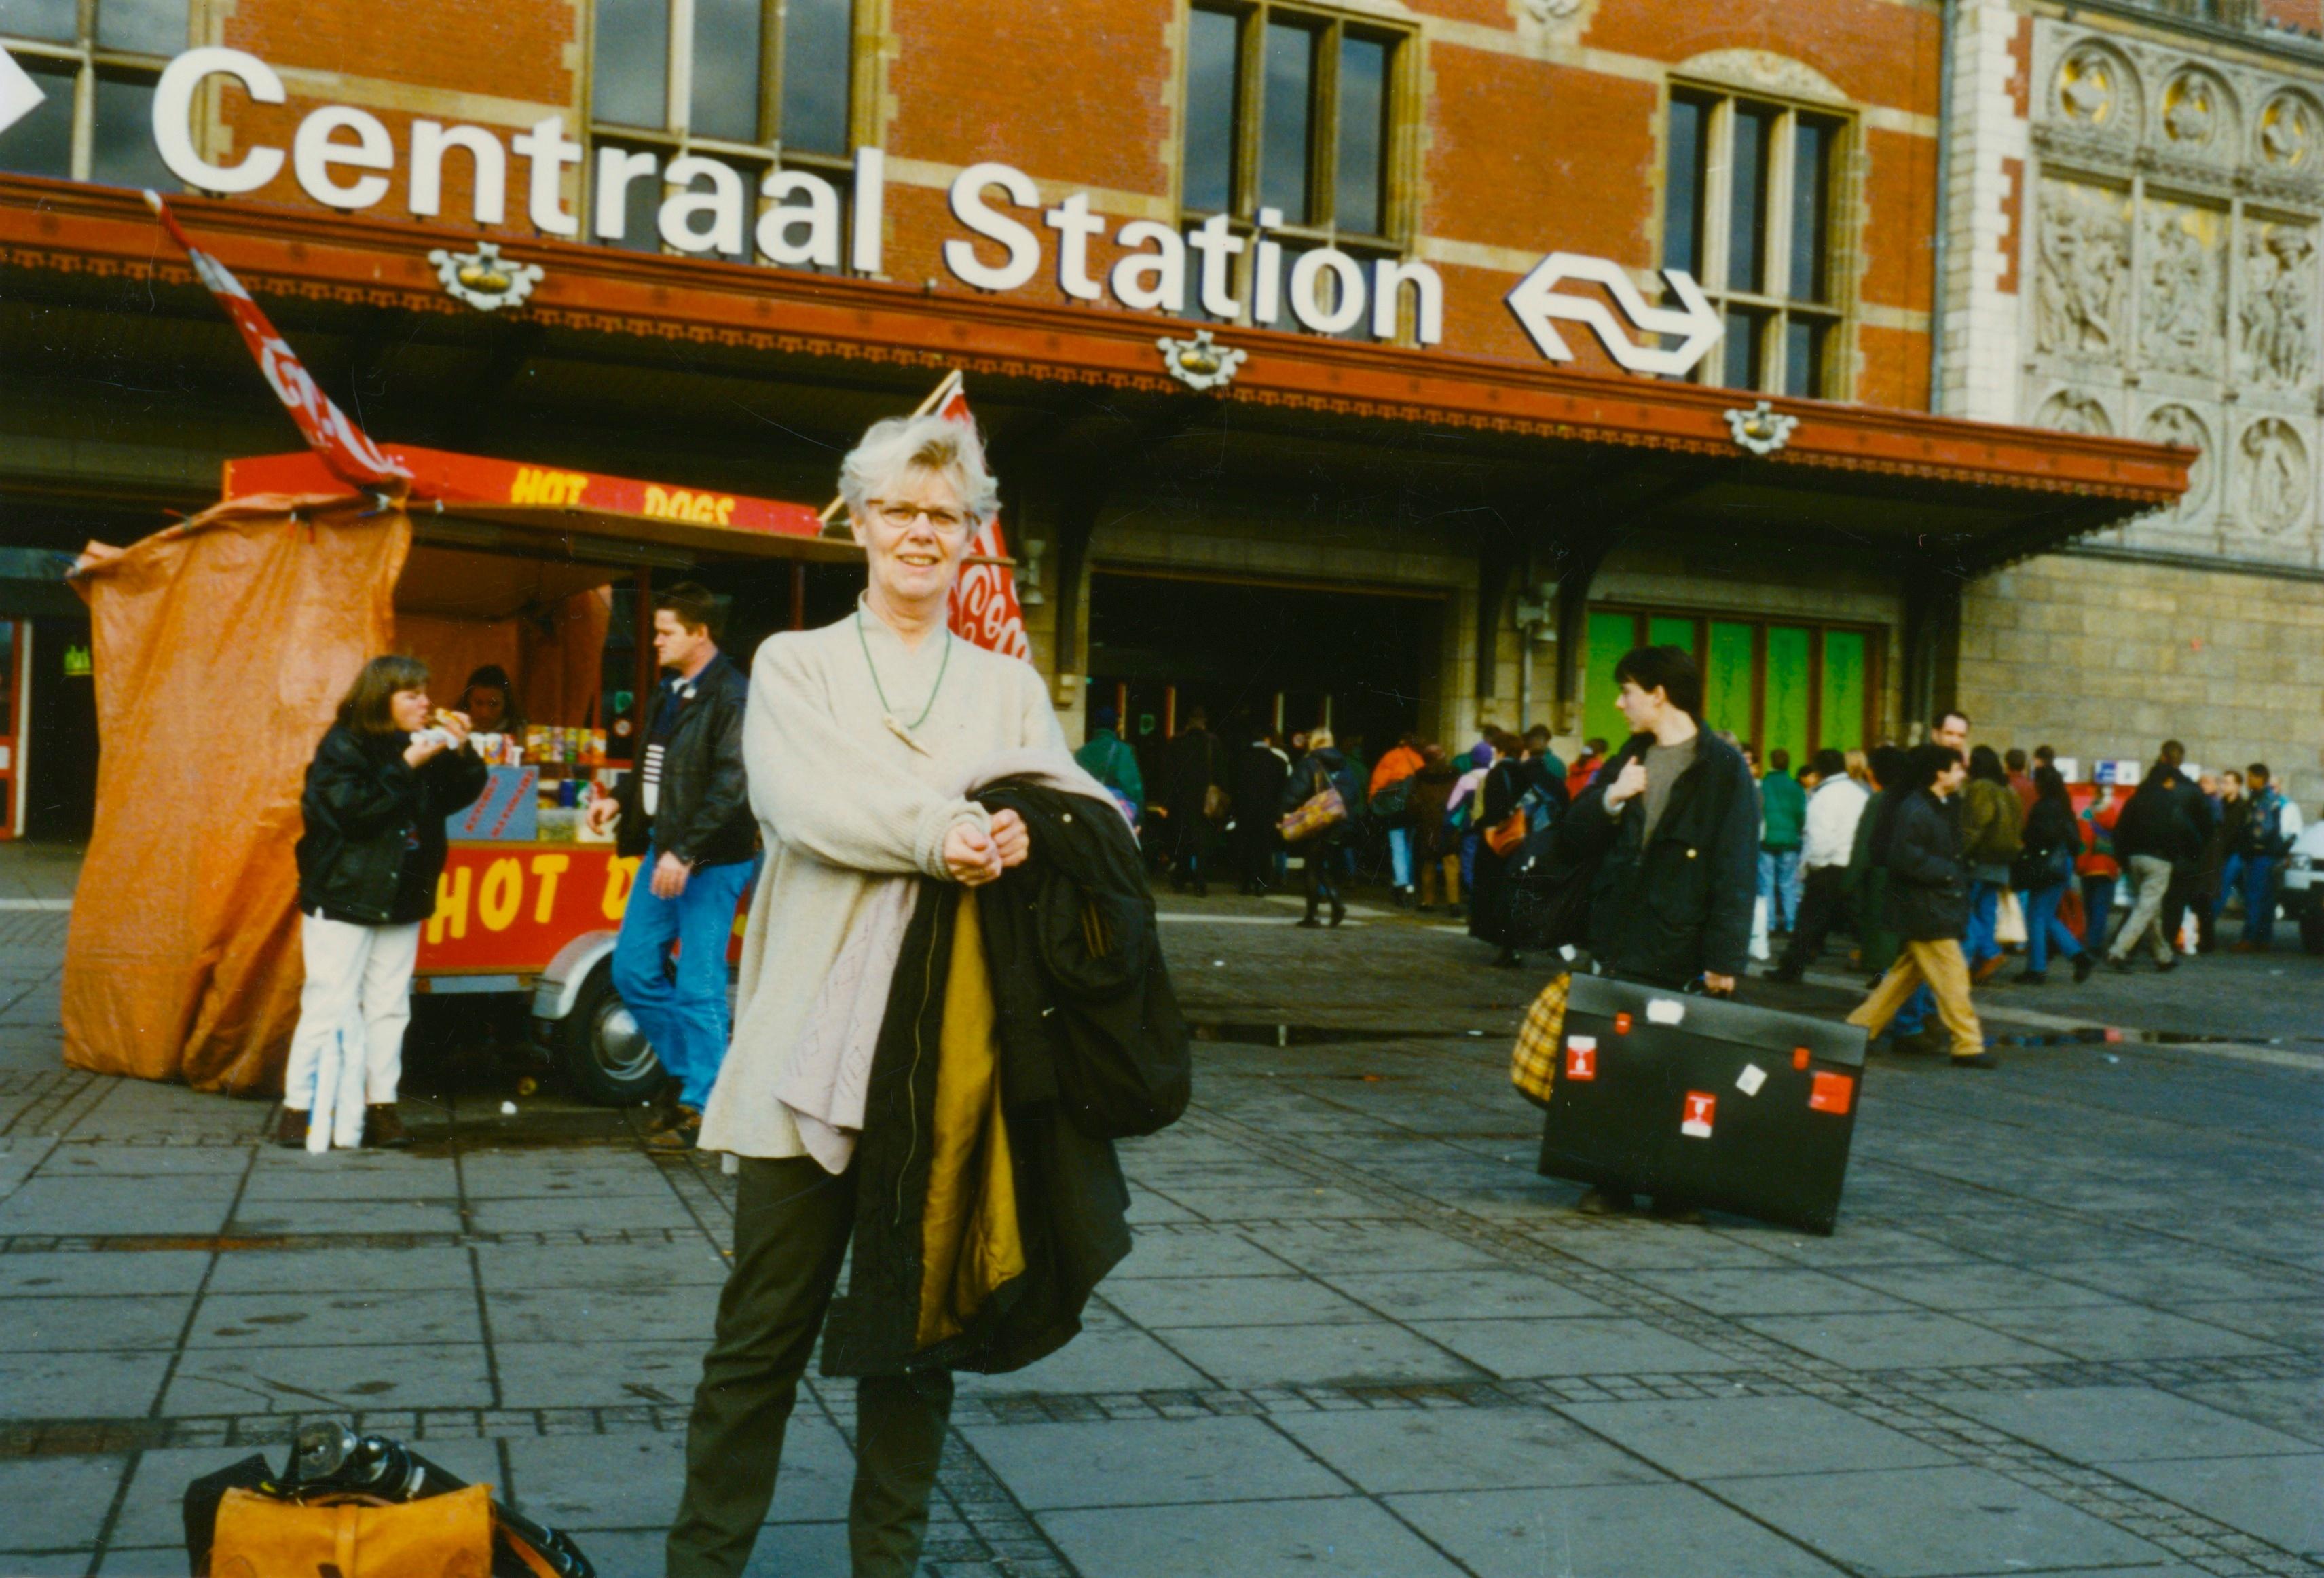 Claartje Keur, Zelfportret met halssieraad van Marcel Wanders, Amsterdam, Stationsplein, 1996. Foto Claartje Keur